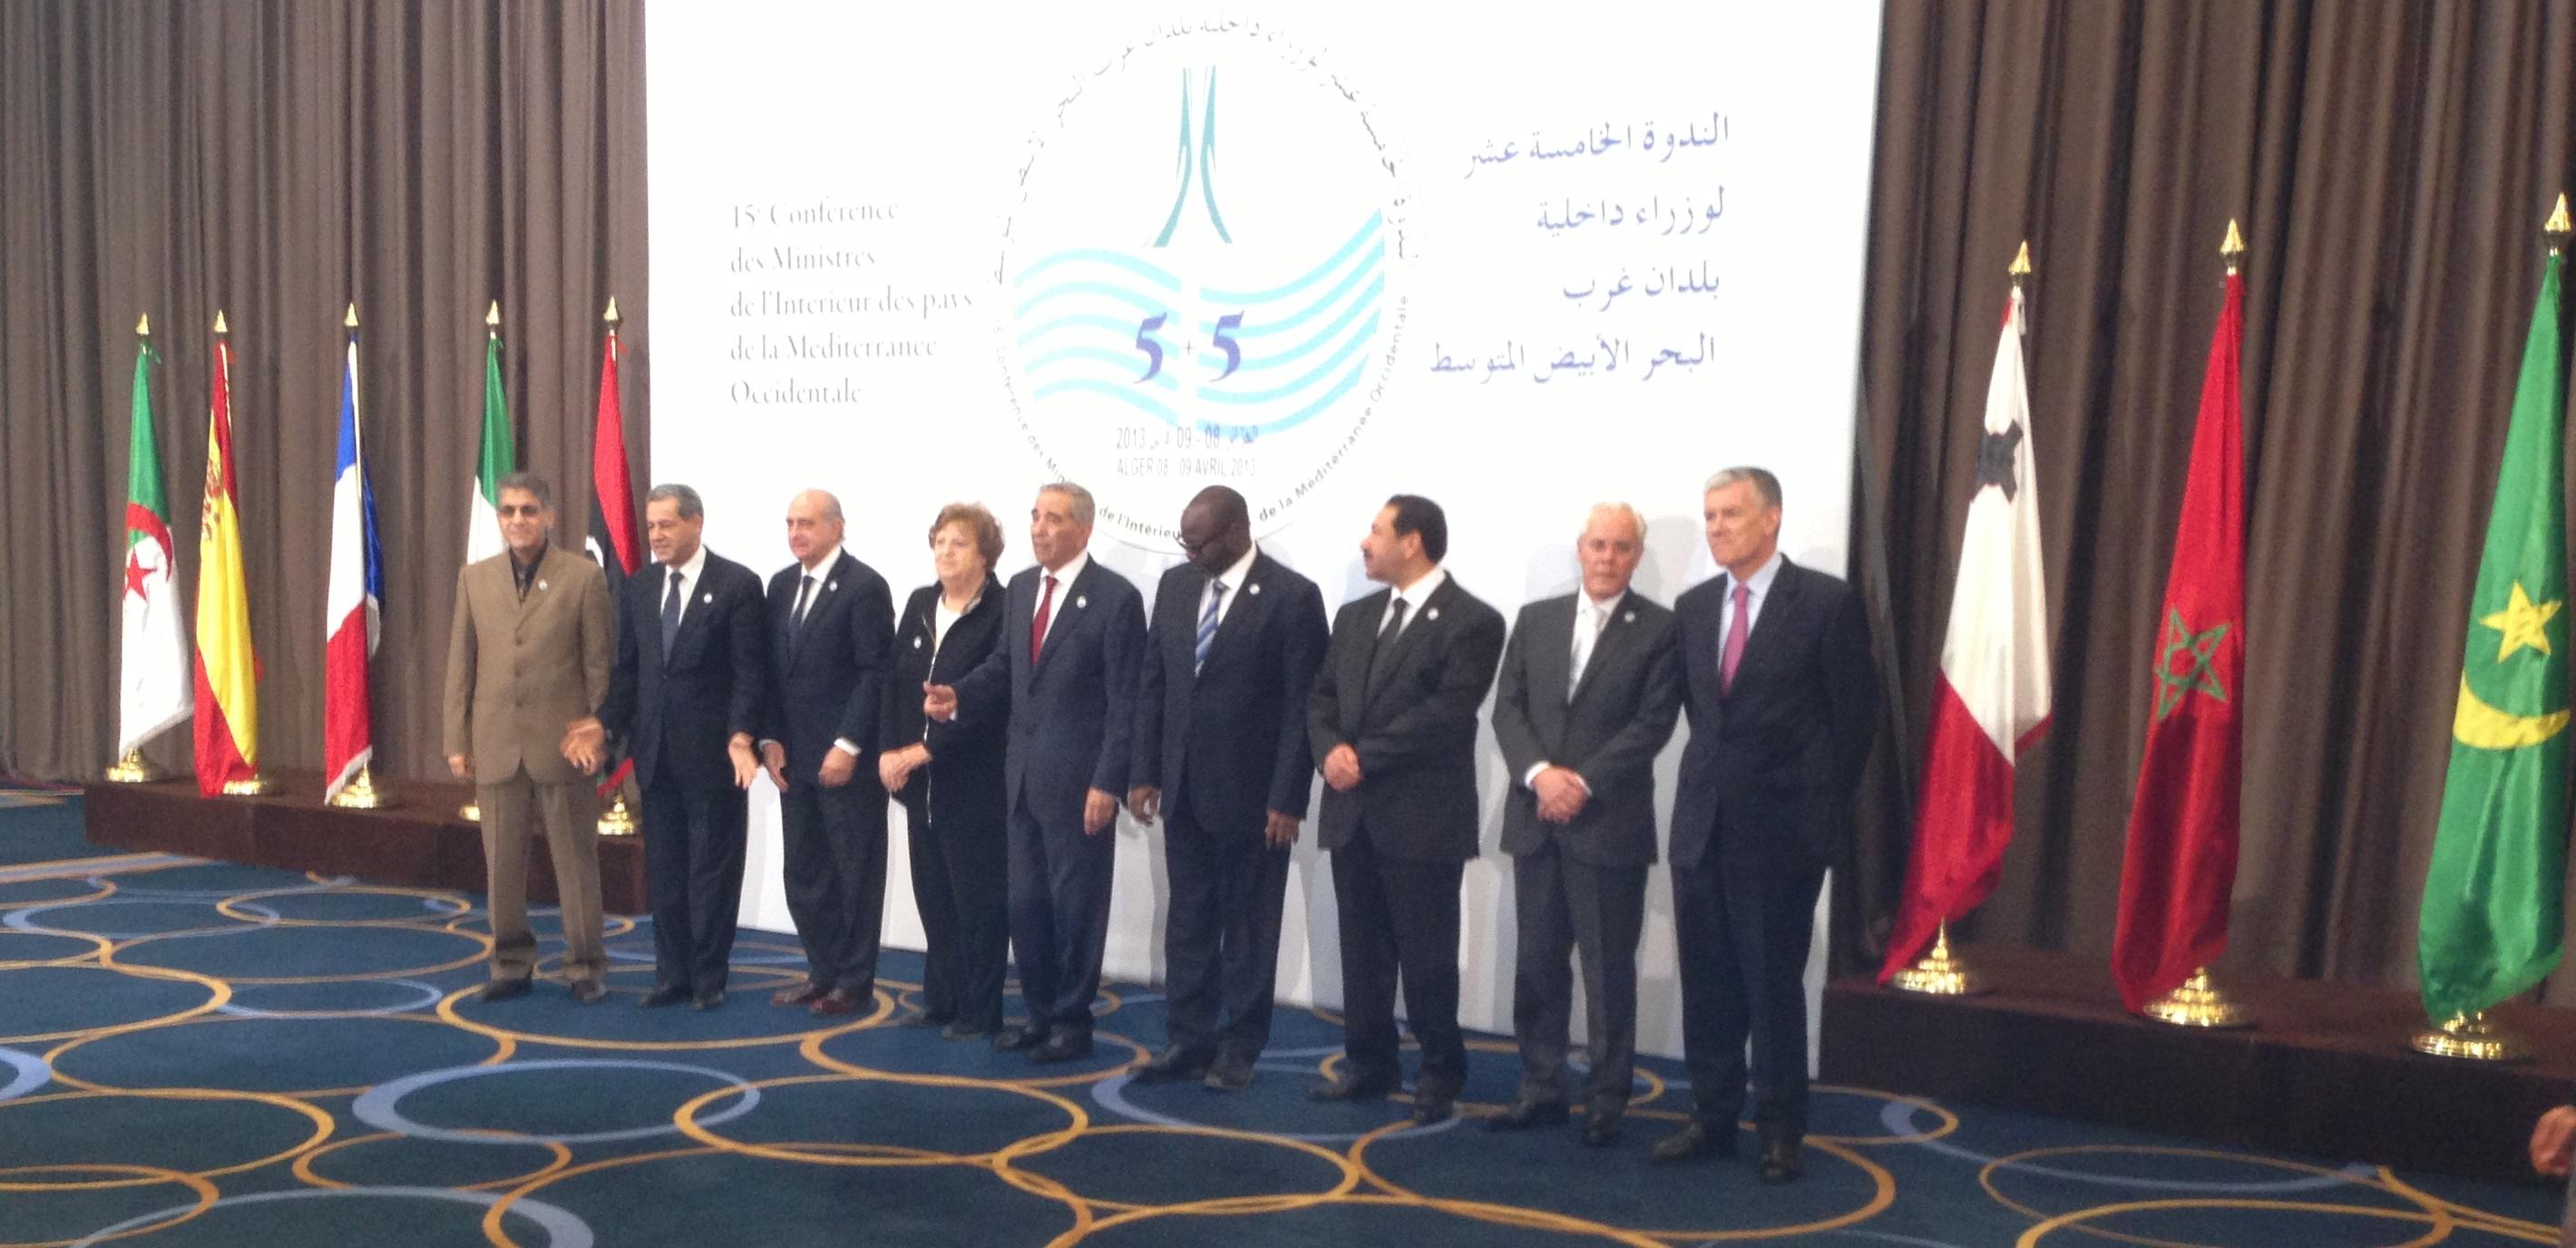 Los ministros del interior de espa a portugal francia for Ministros interior espana